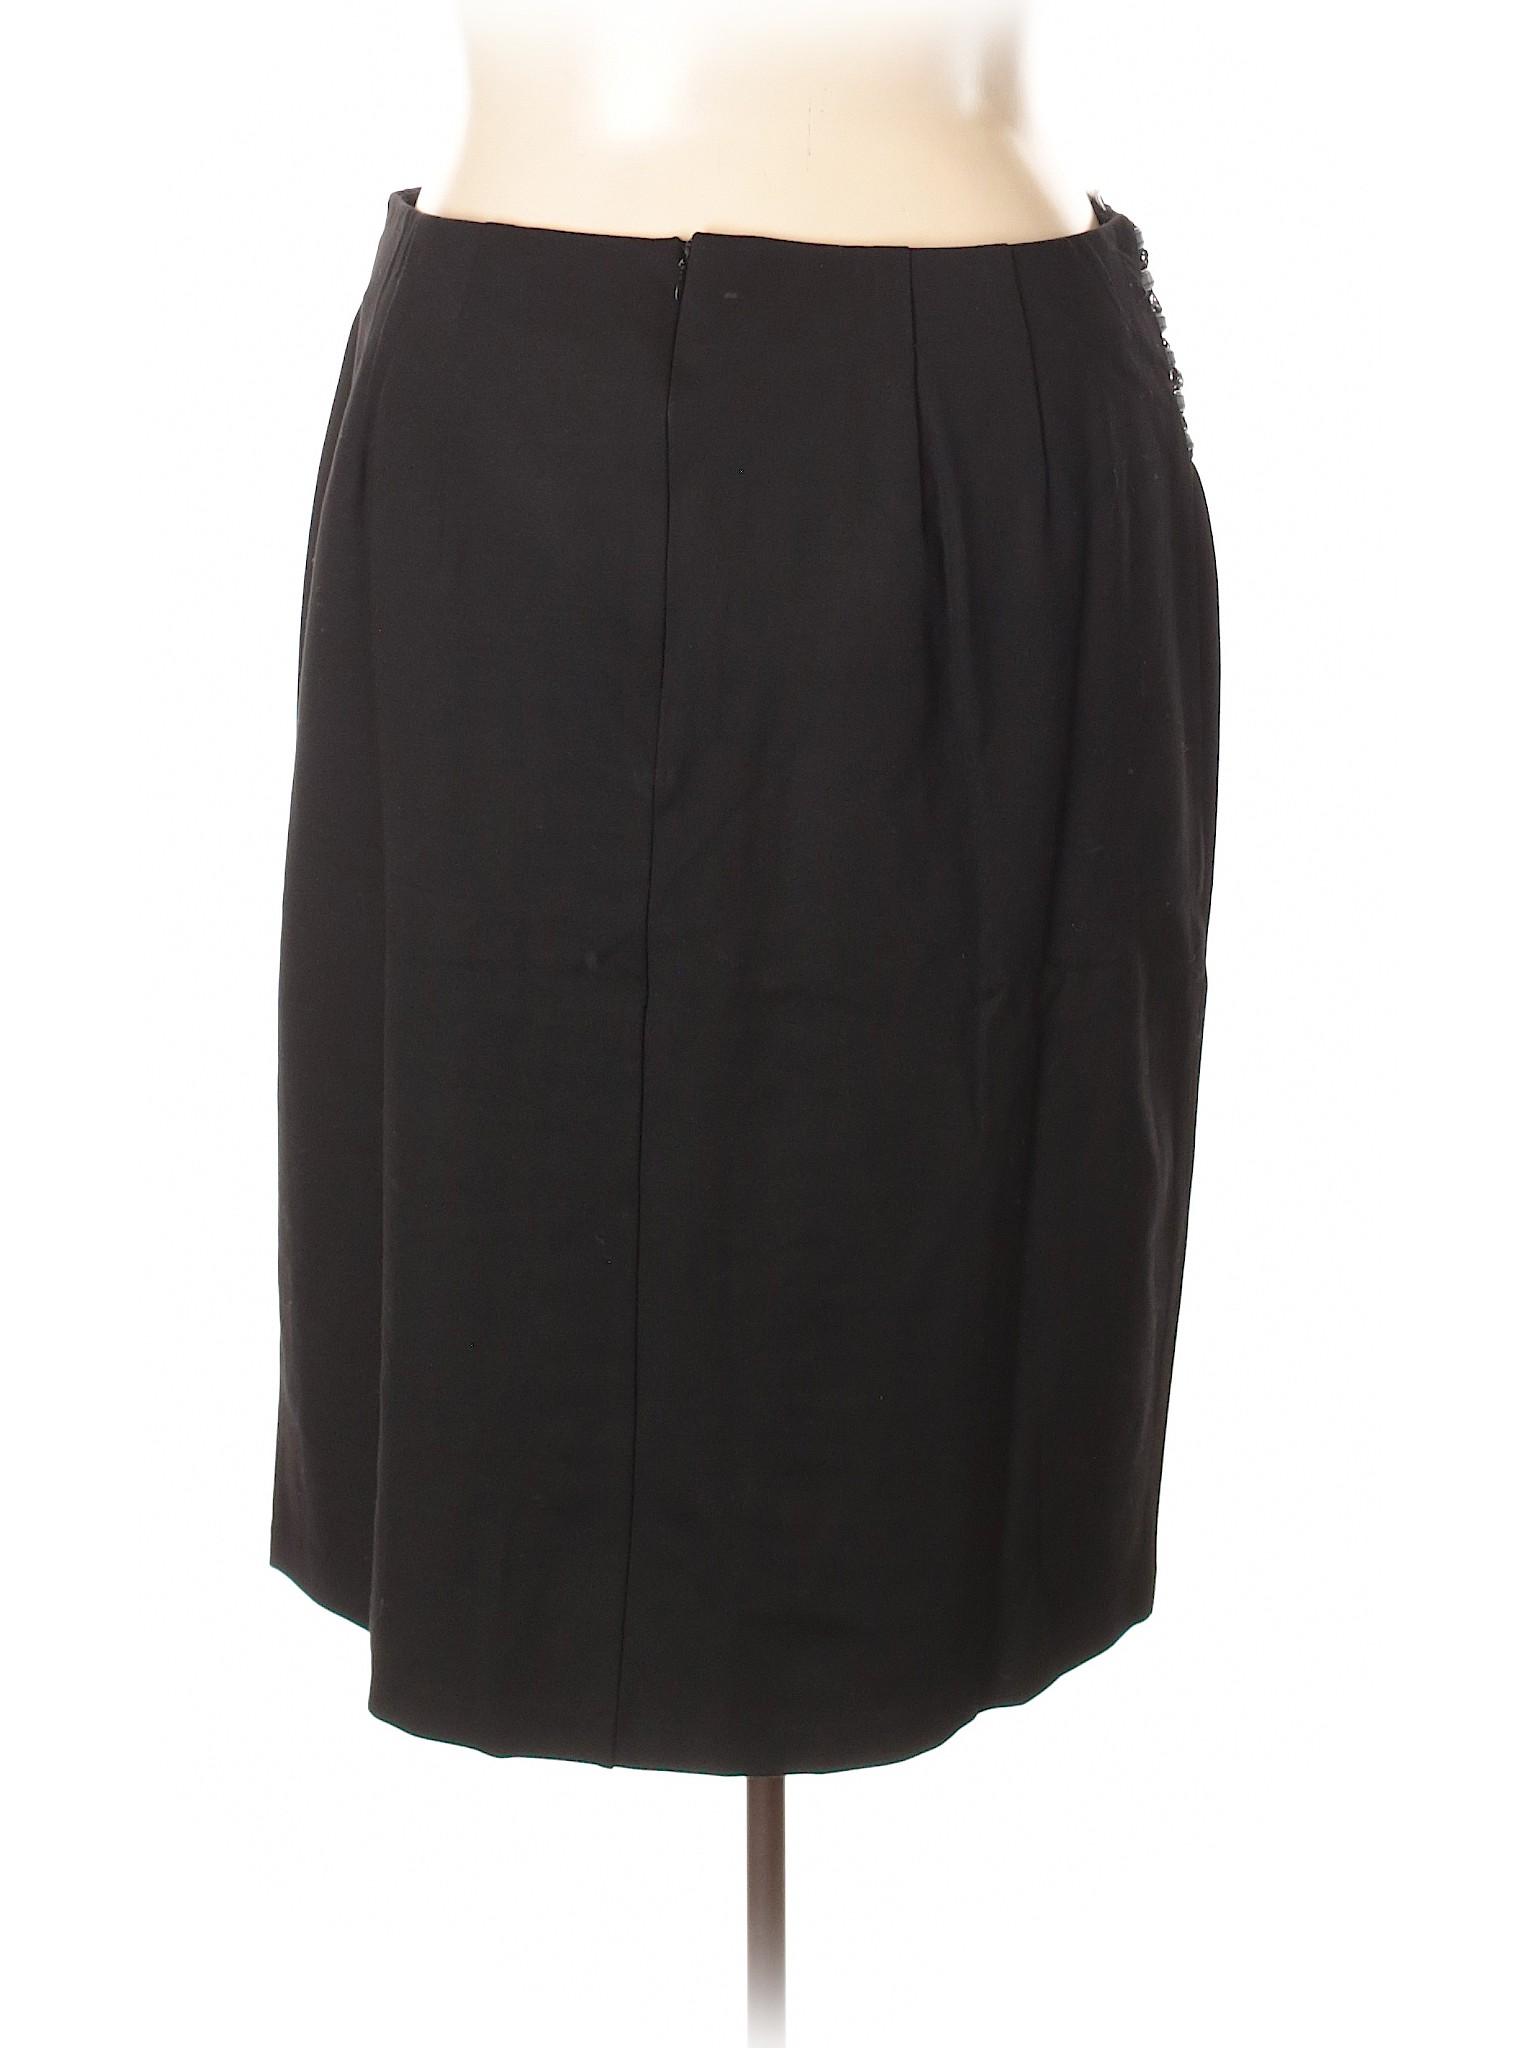 Skirt Boutique Casual Casual Boutique q7wz6wft